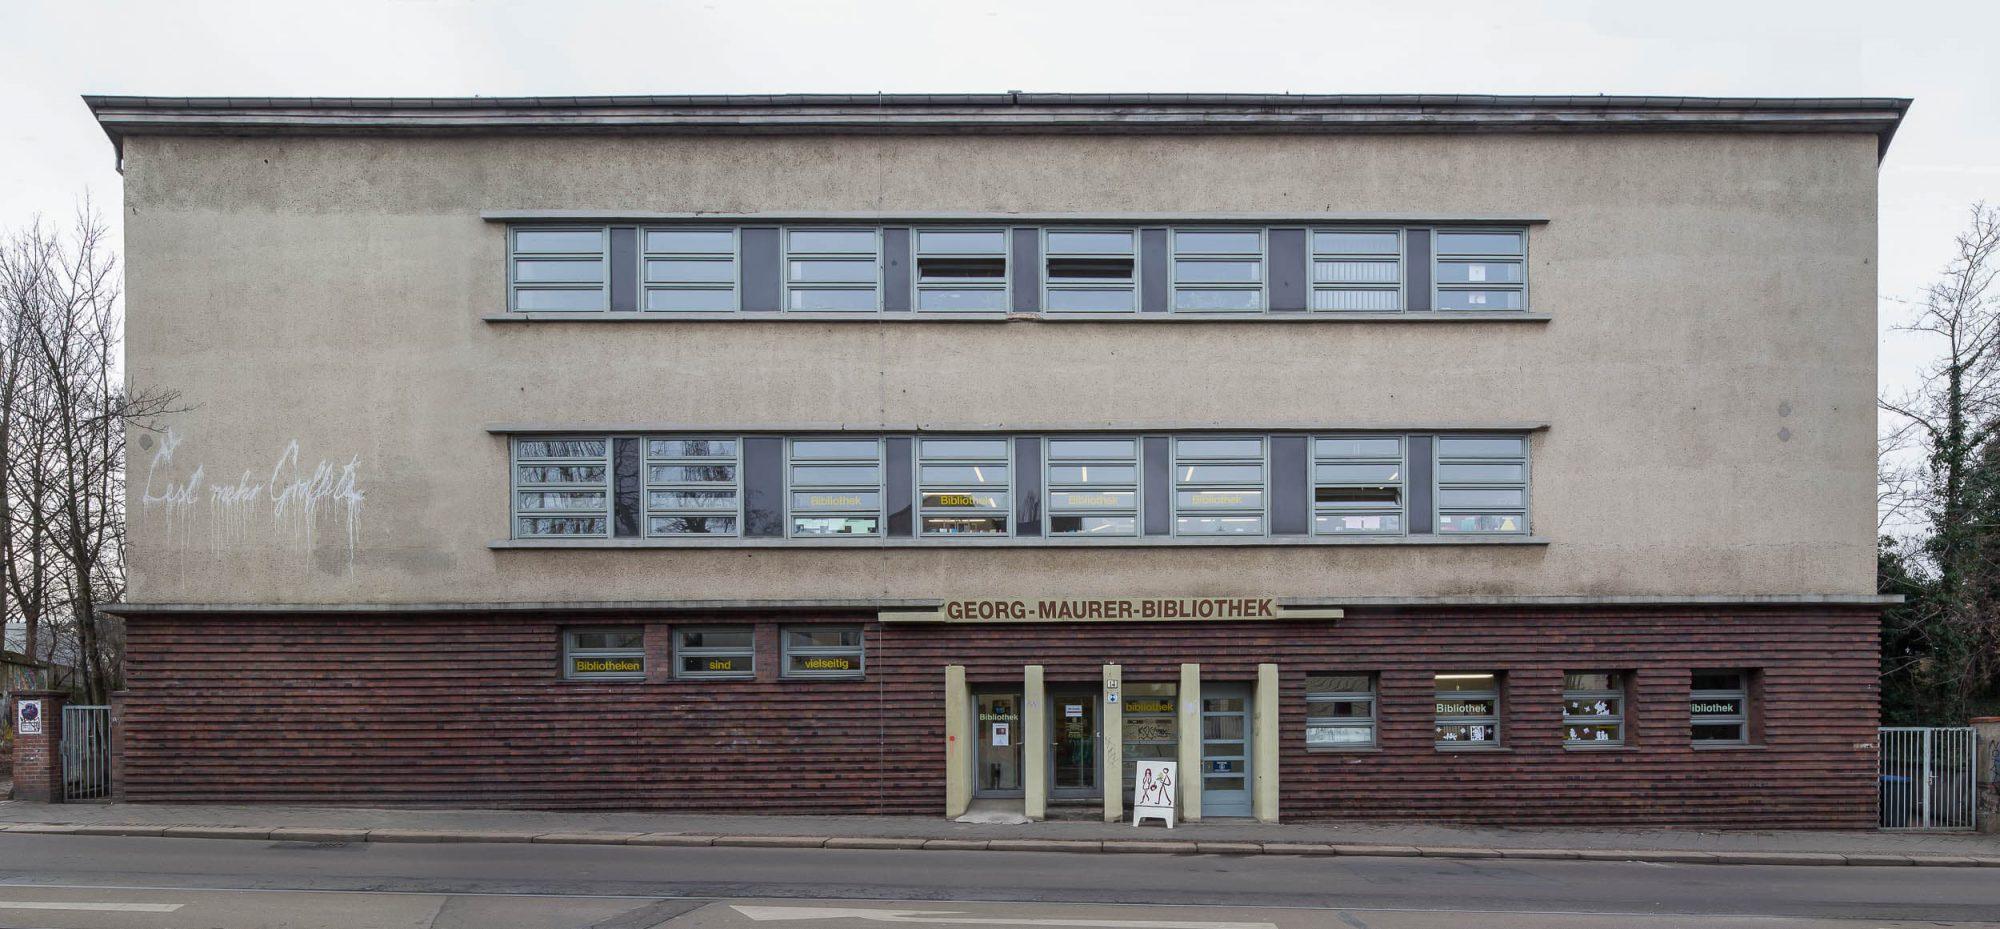 Regentaucher Architekturfotografie | W&V Architekten Langendorfer Straße